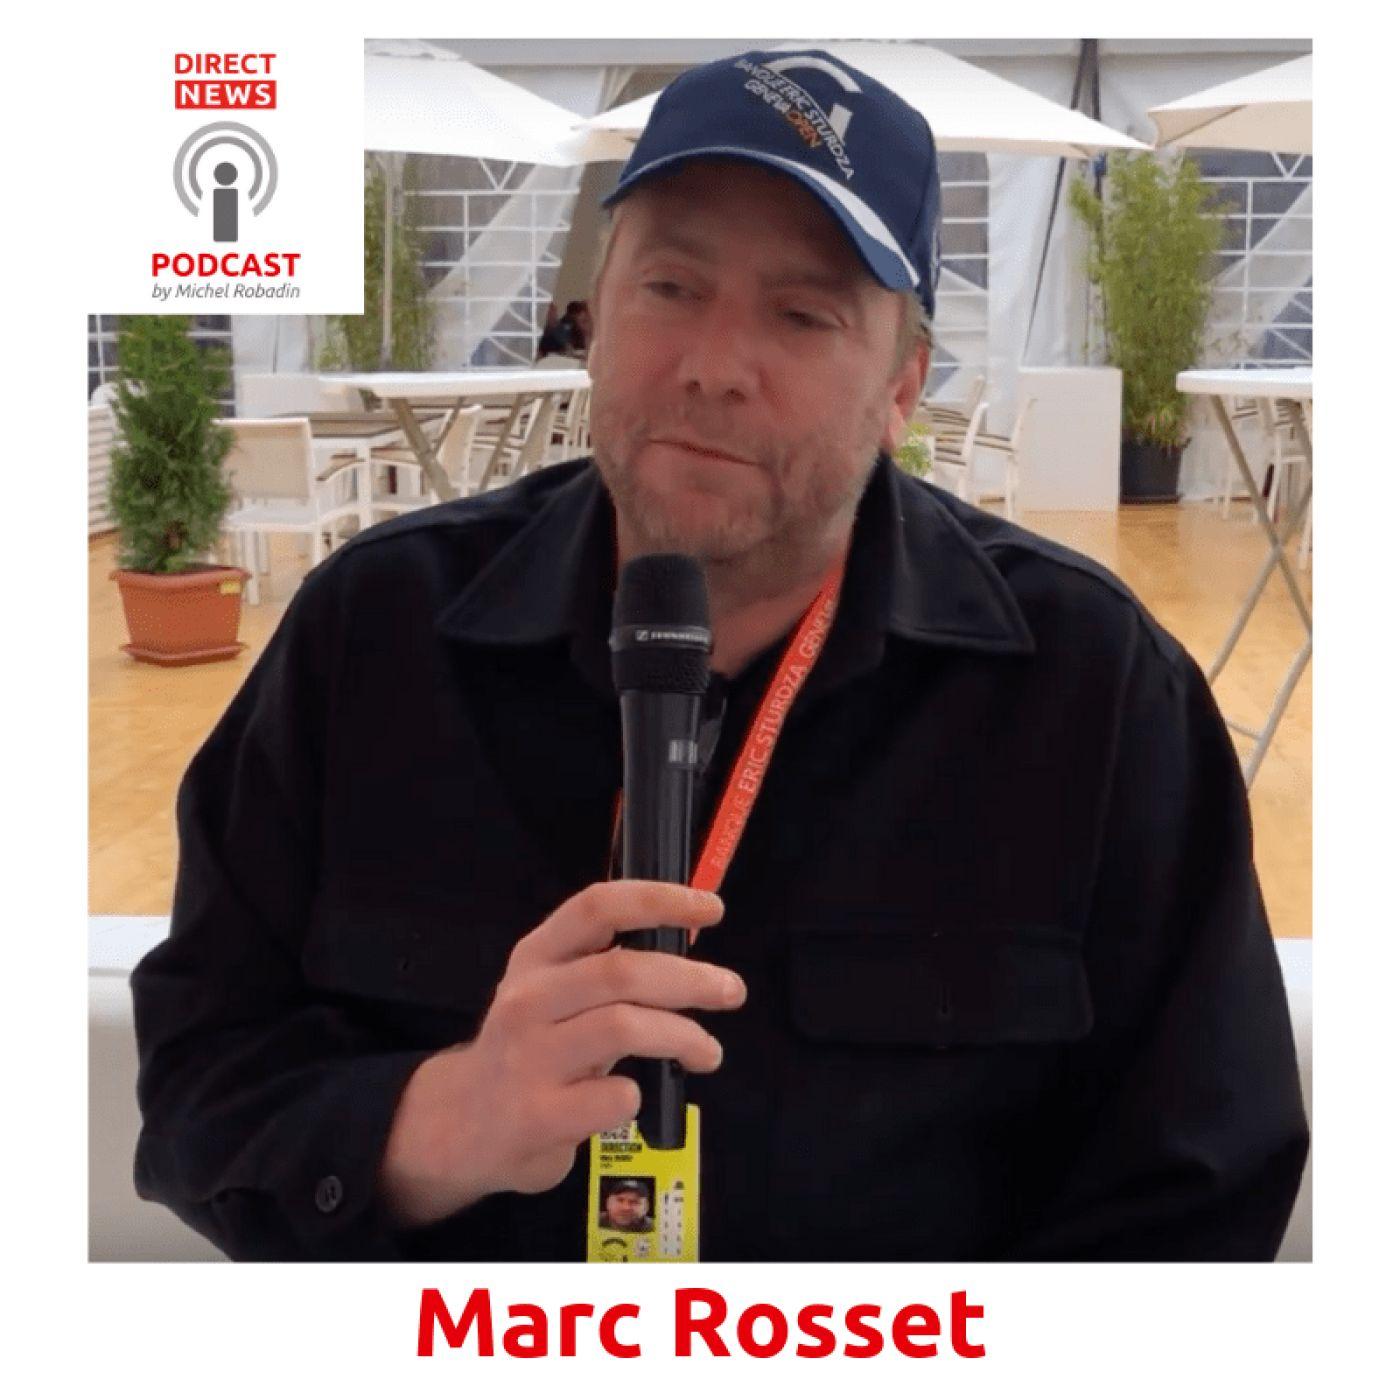 Marc Rosset